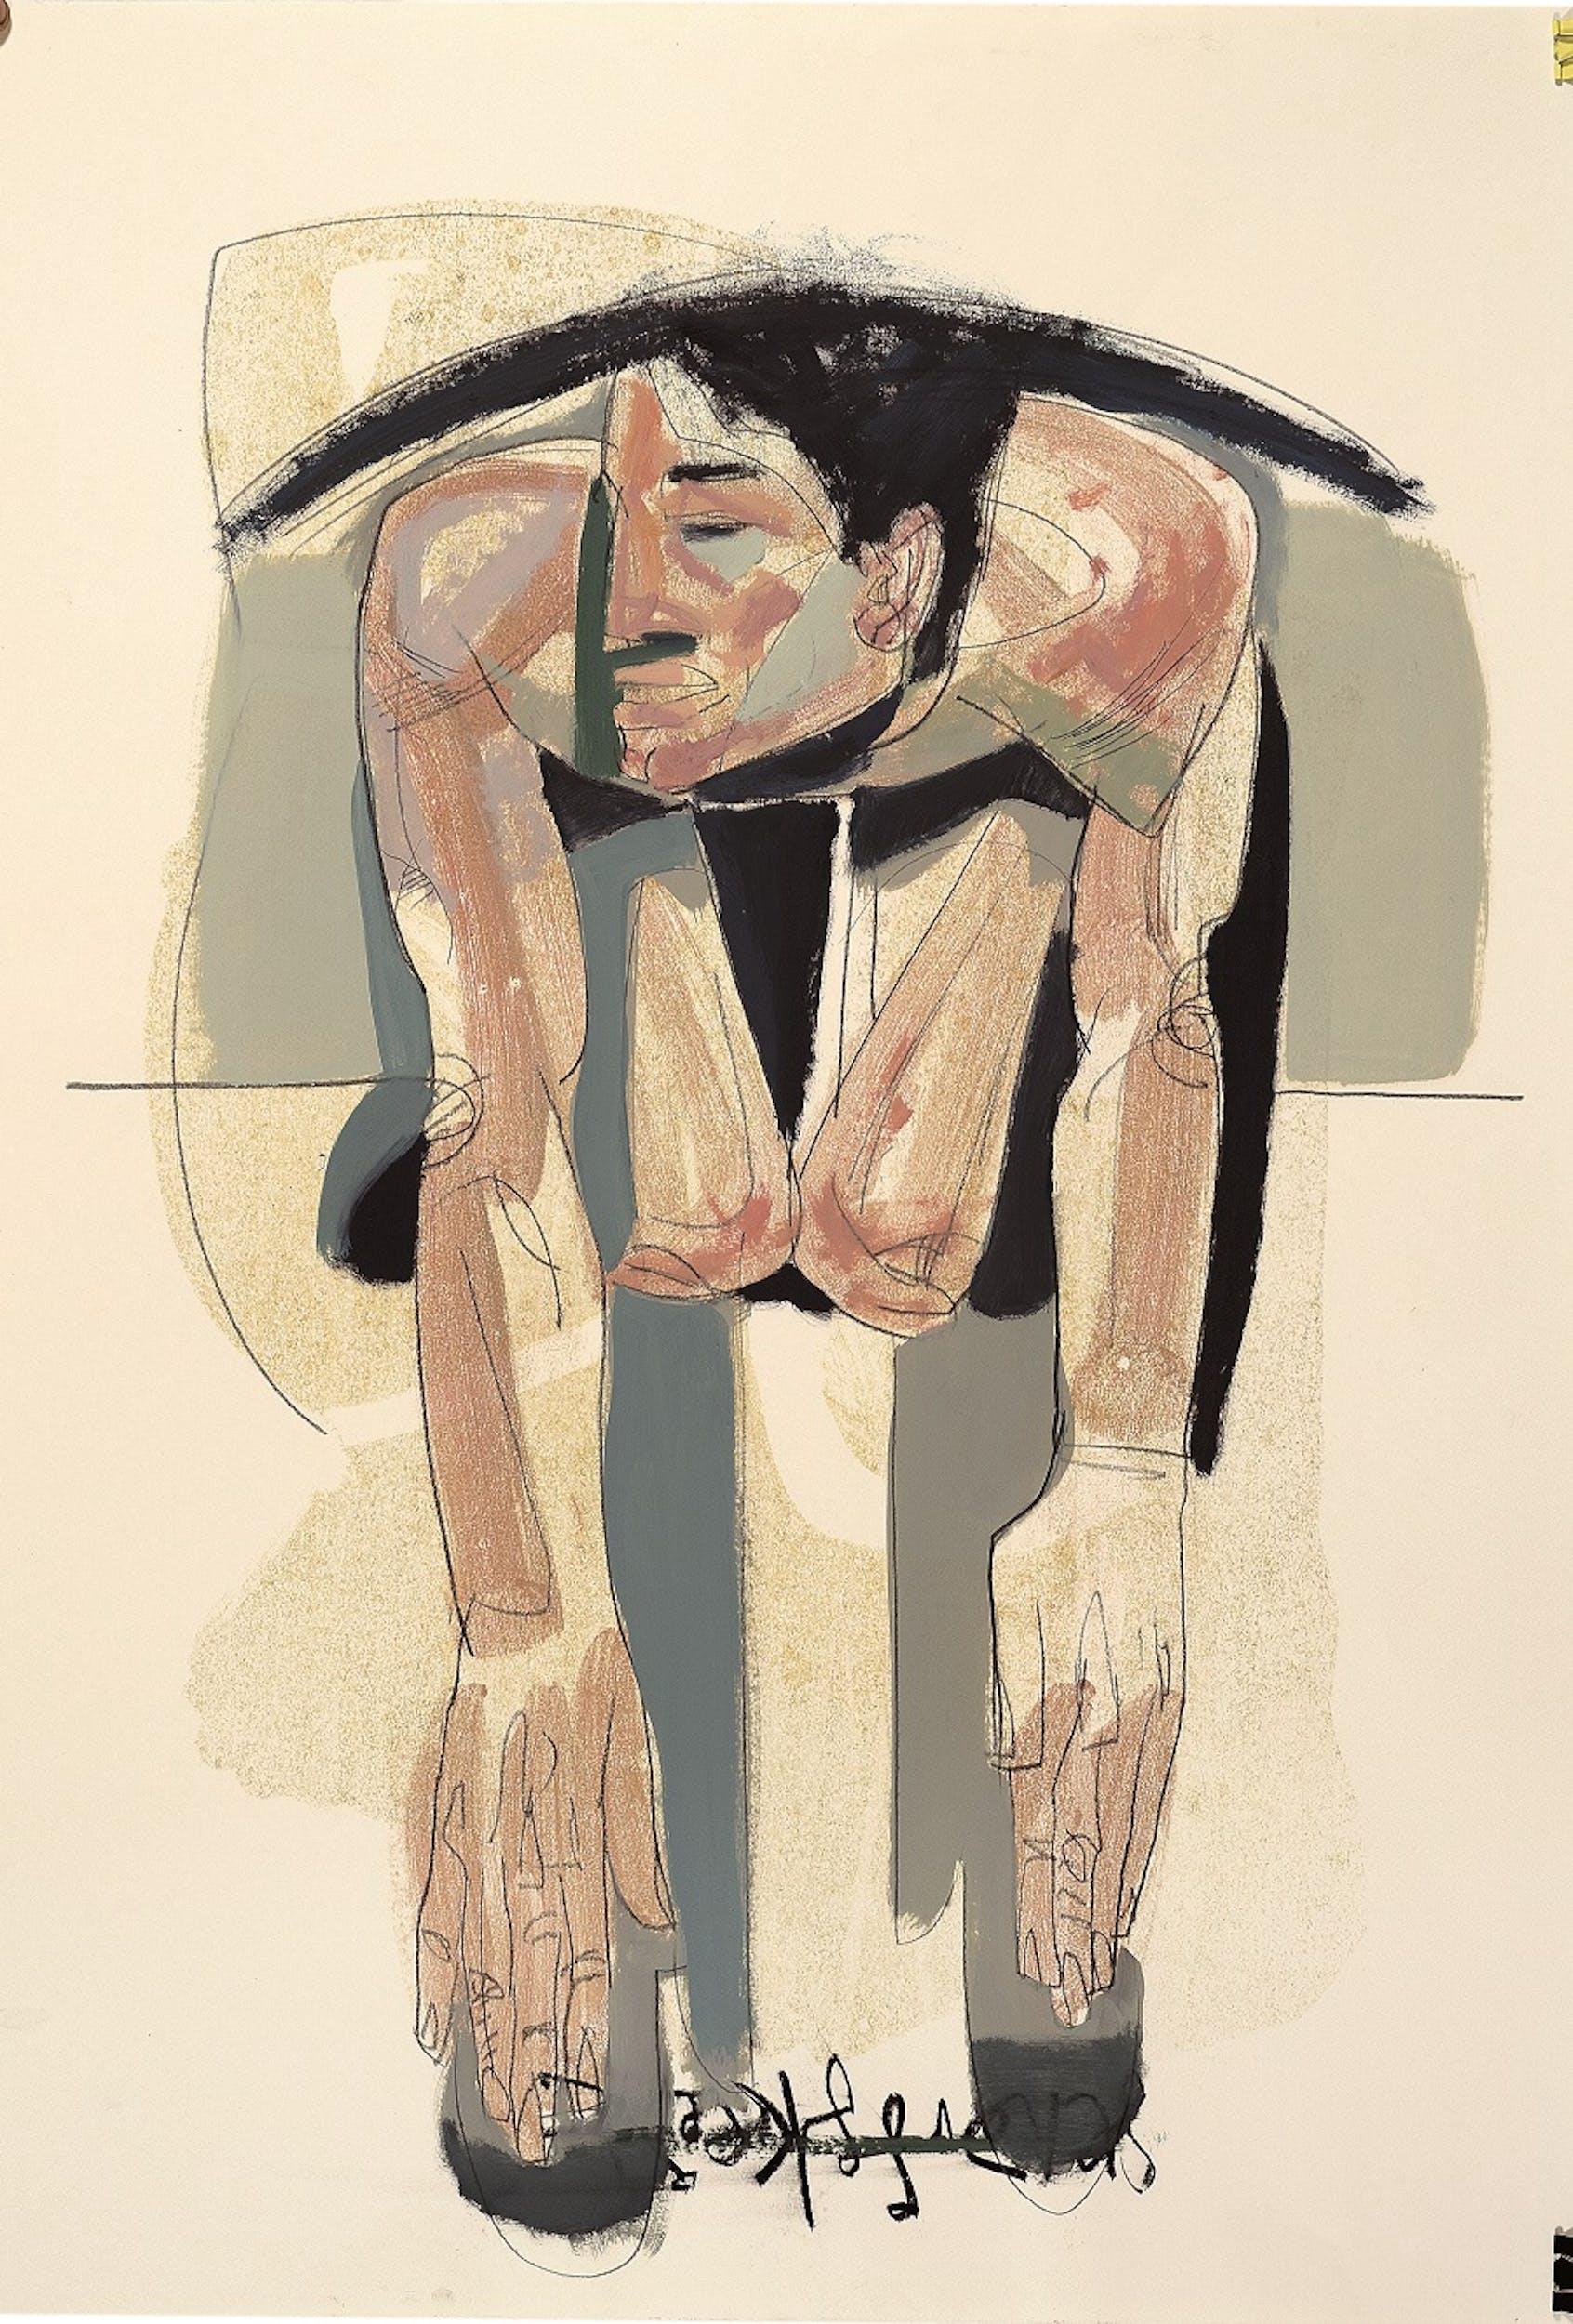 Tesfaye Urgessa, Innocence (Innocenza) 2018, olio su carta - monotipo, oil on paper - monotype.